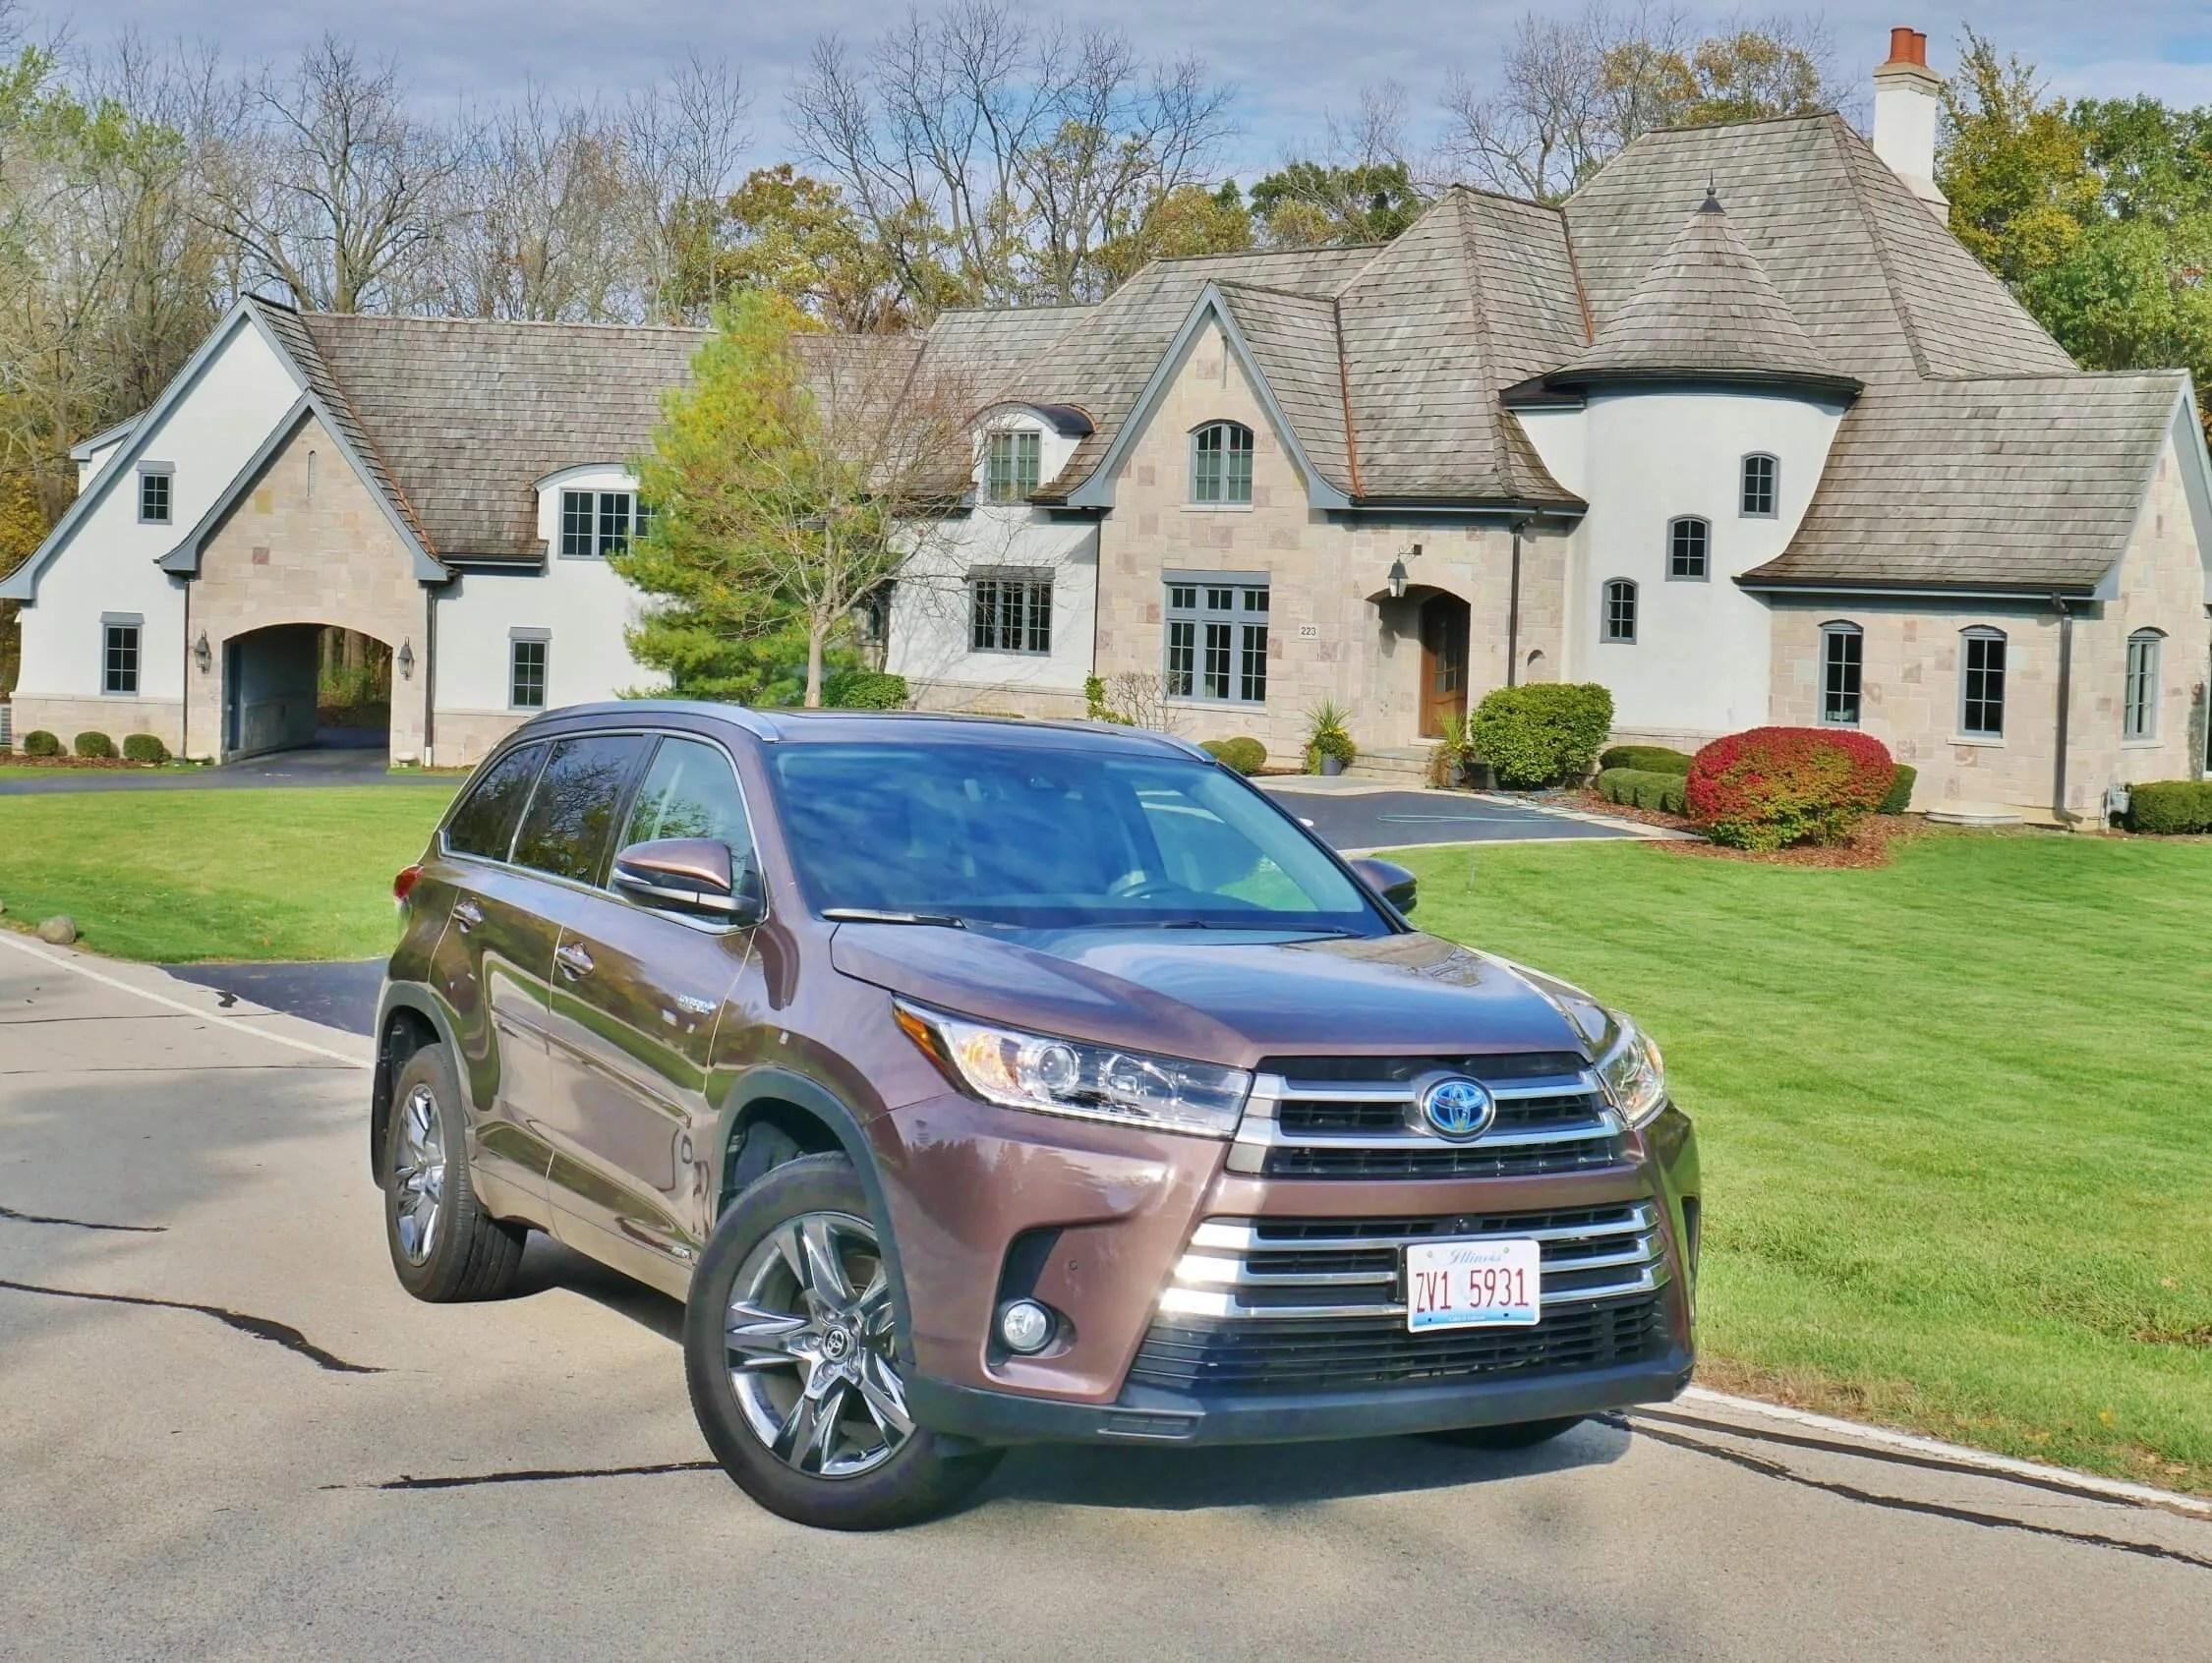 2017 Toyota Highlander Hybrid Limited Platinum AWD U2013 Bottom Line Review |  RoadBlazing